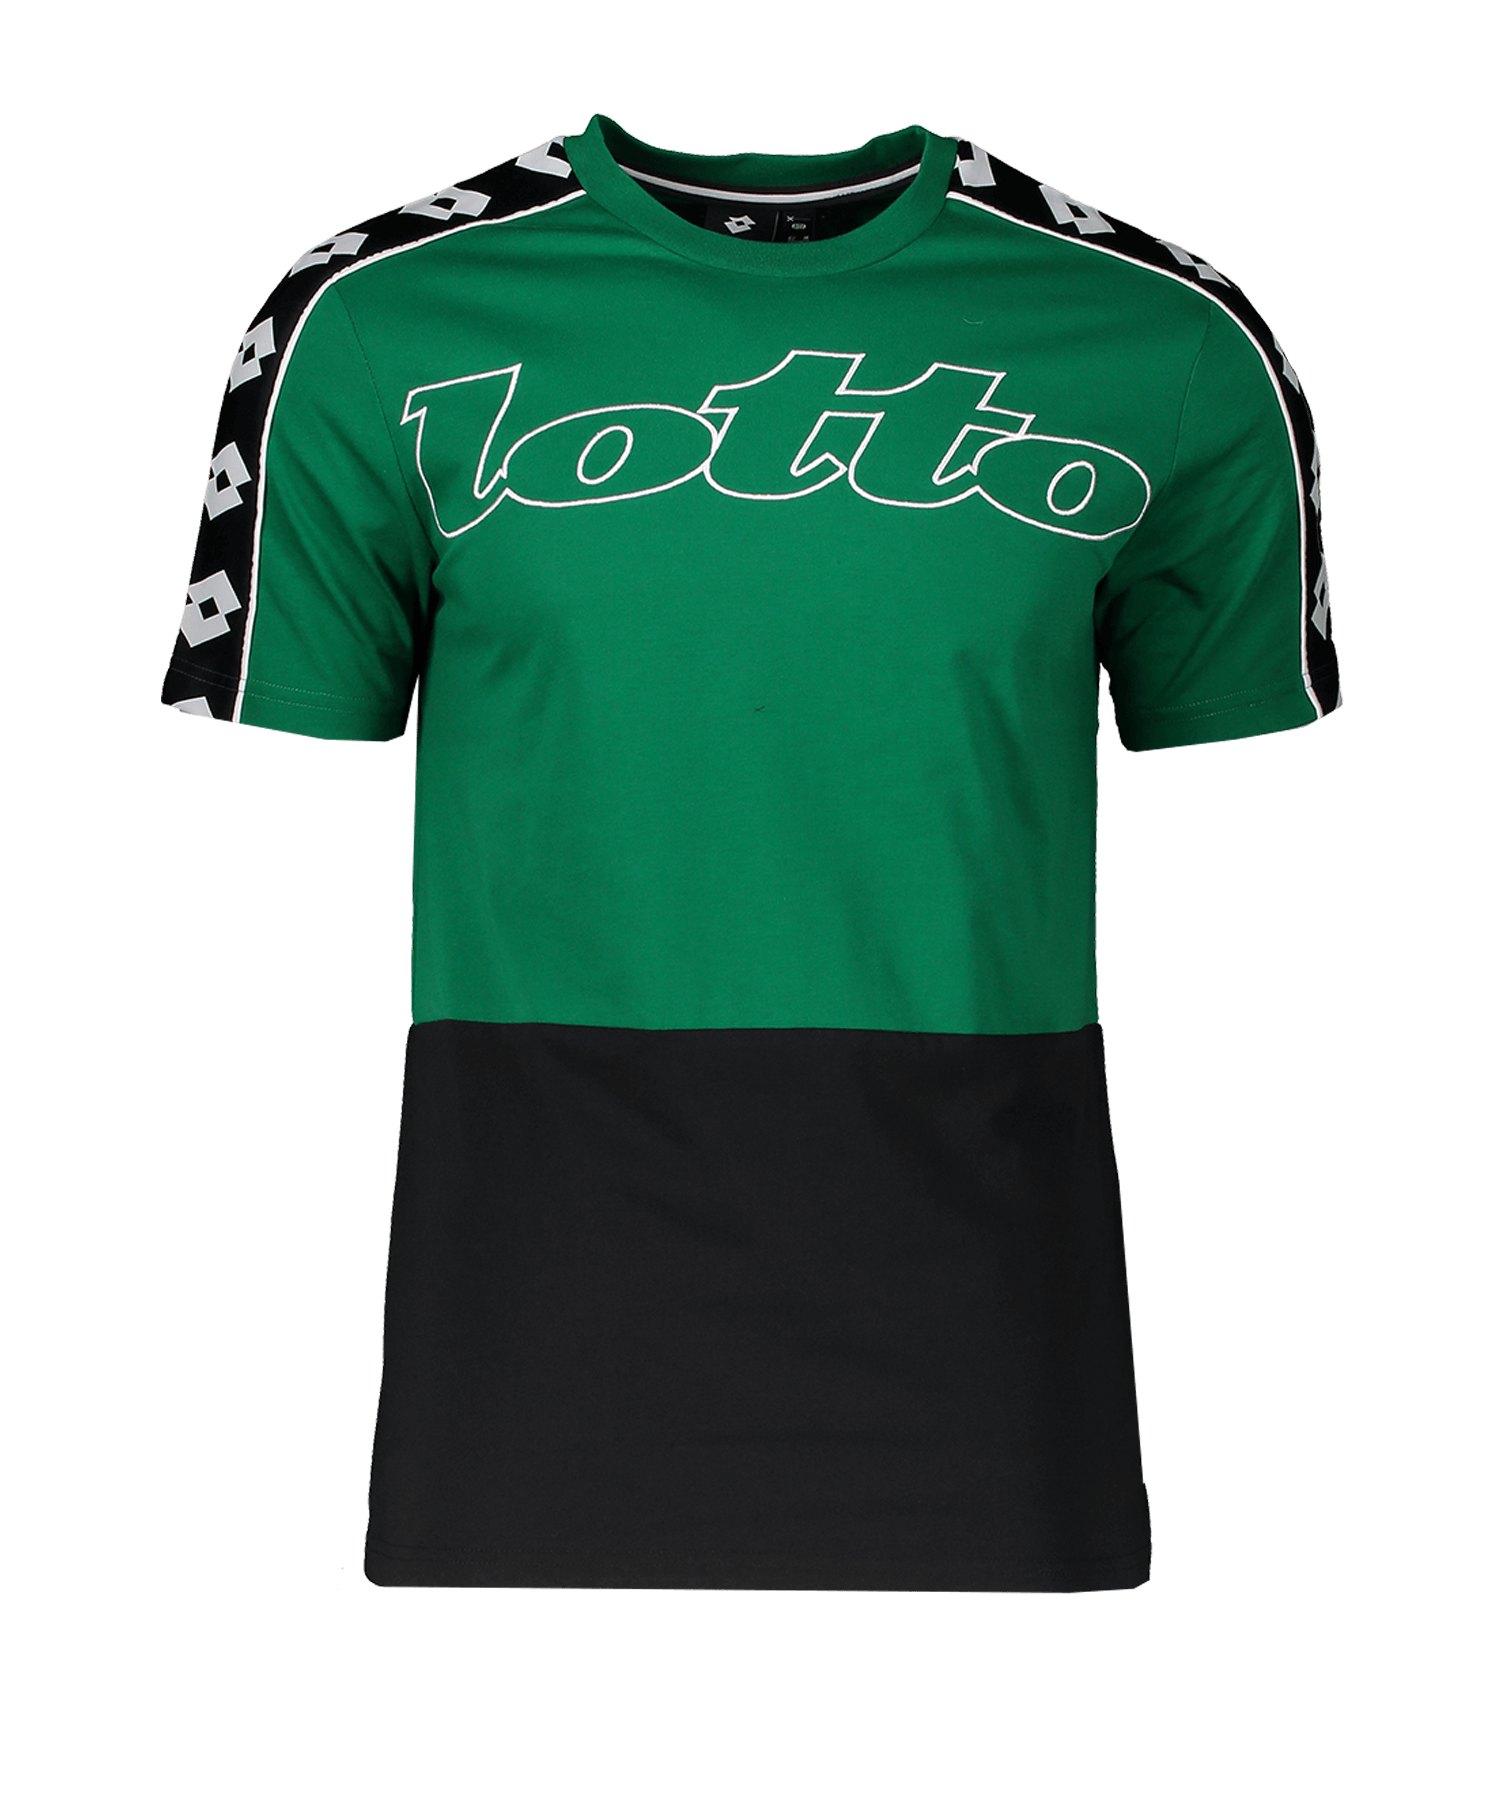 Lotto Athletica Prime Tee T-Shirt Grün F5PH - gruen